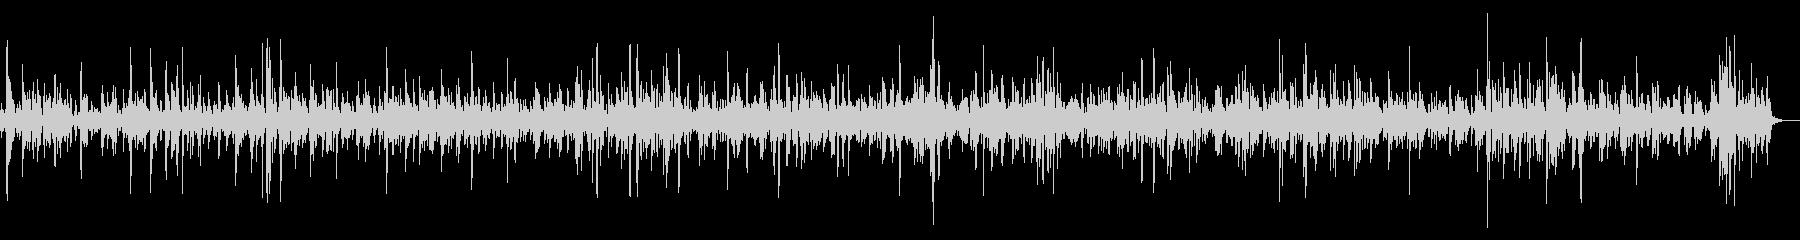 JAZZピアノ|店舗配信・映像制作BGMの未再生の波形